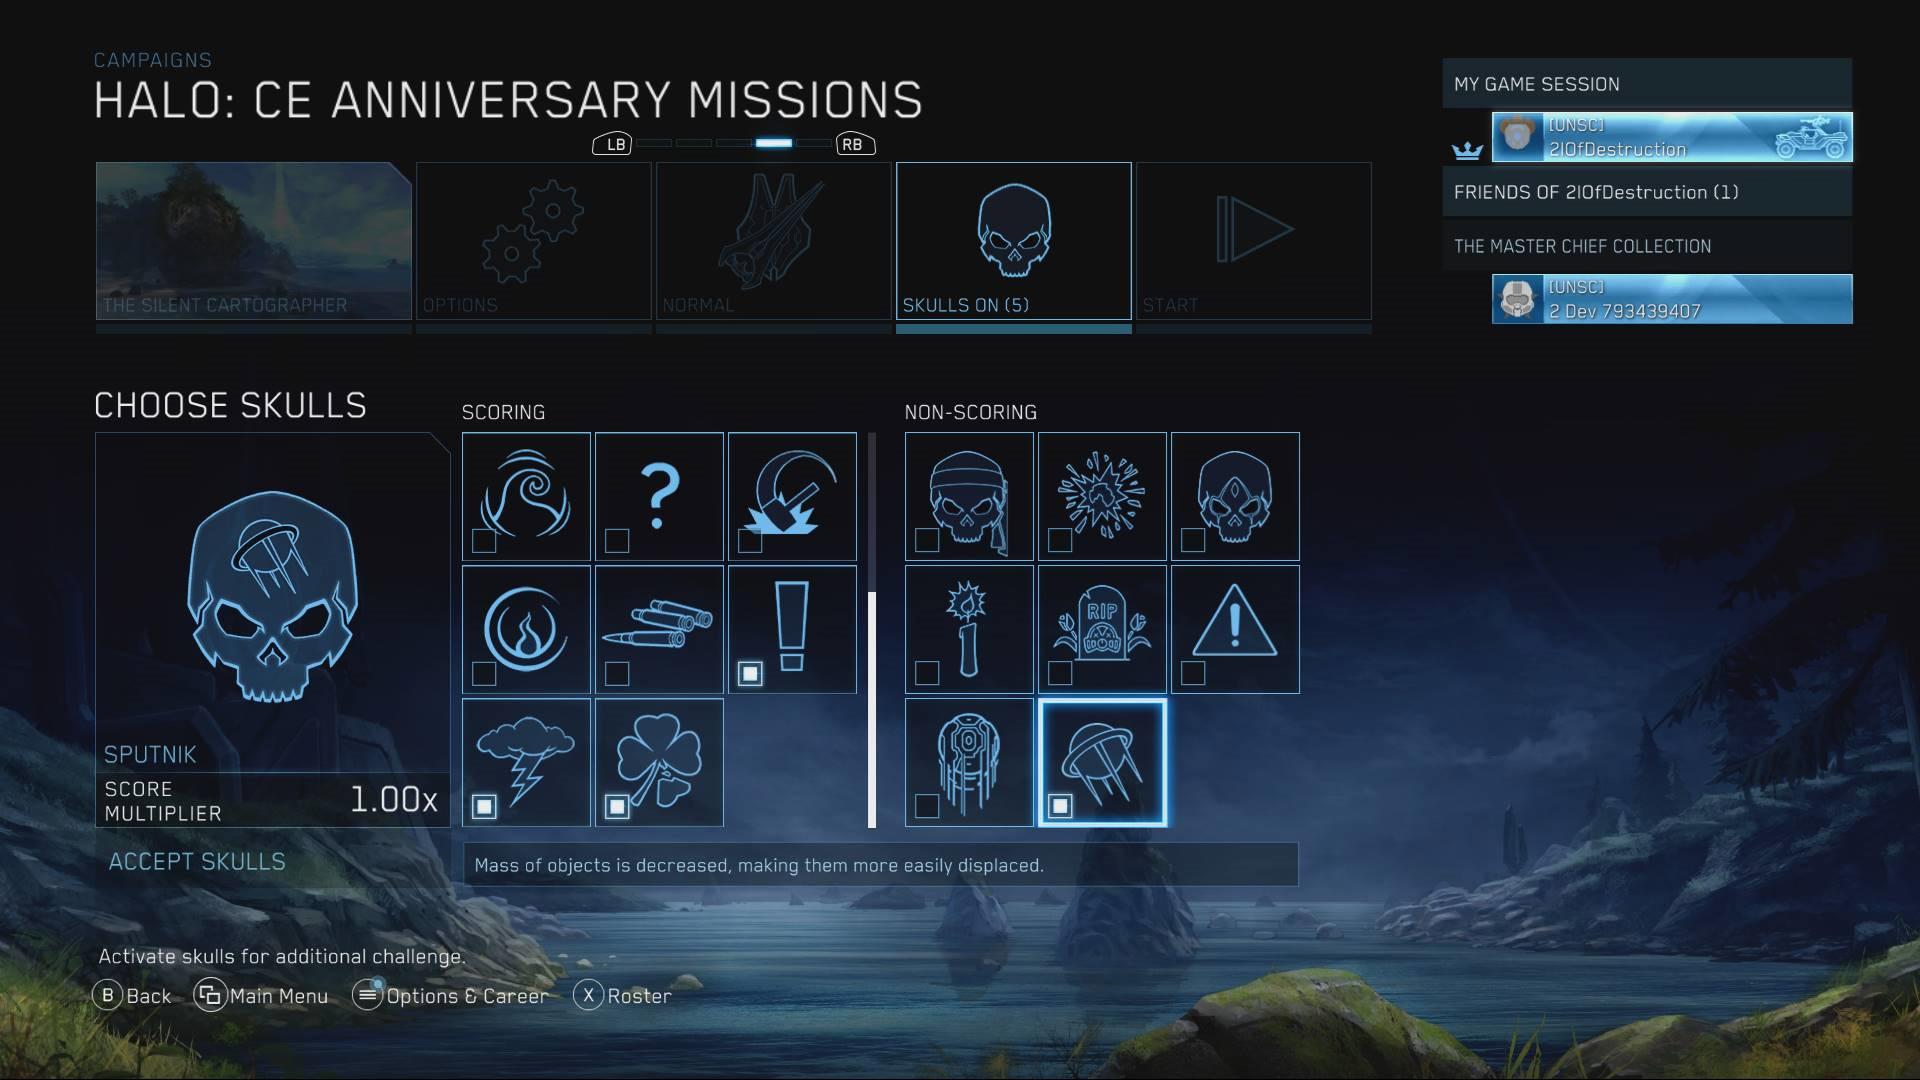 MissionsScreen.jpg